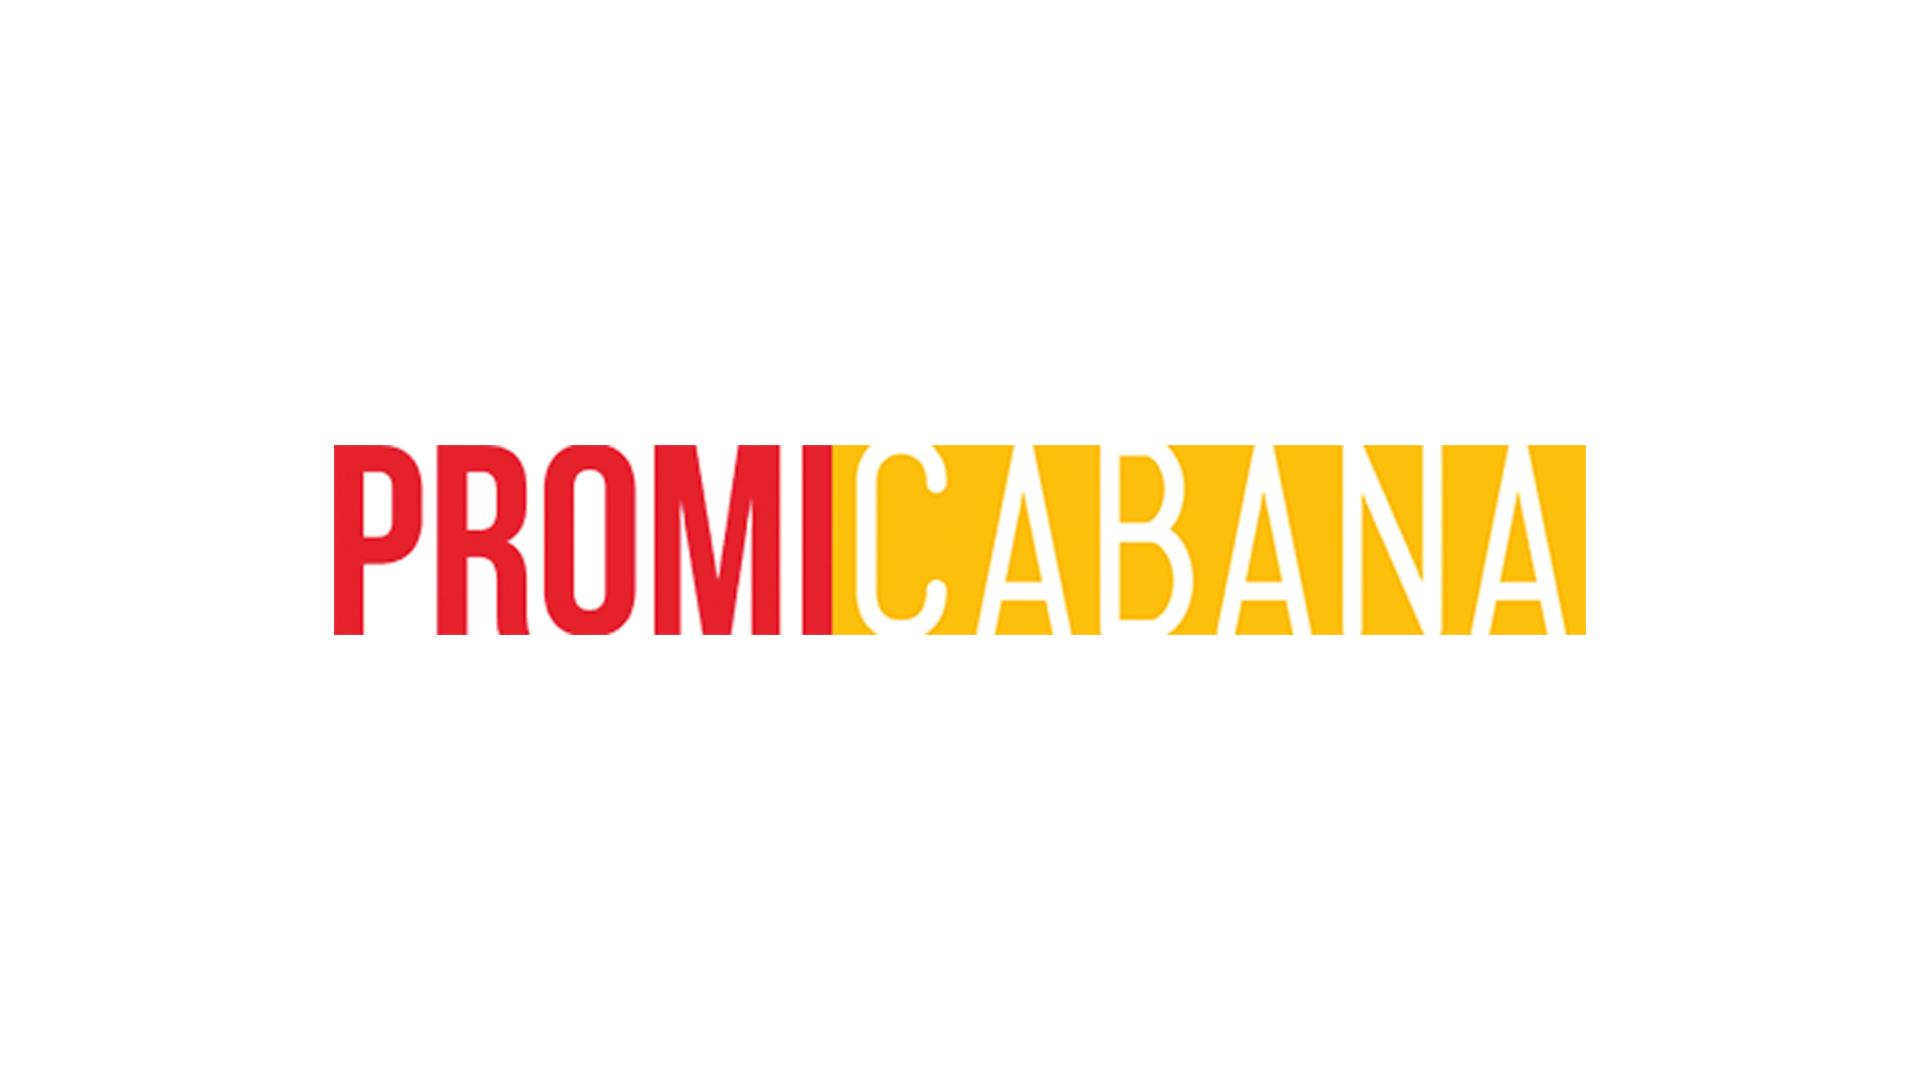 Shailene-Woodley-Theo-James-Ansel-Elgort-The-Divergent-Series-Allegiant